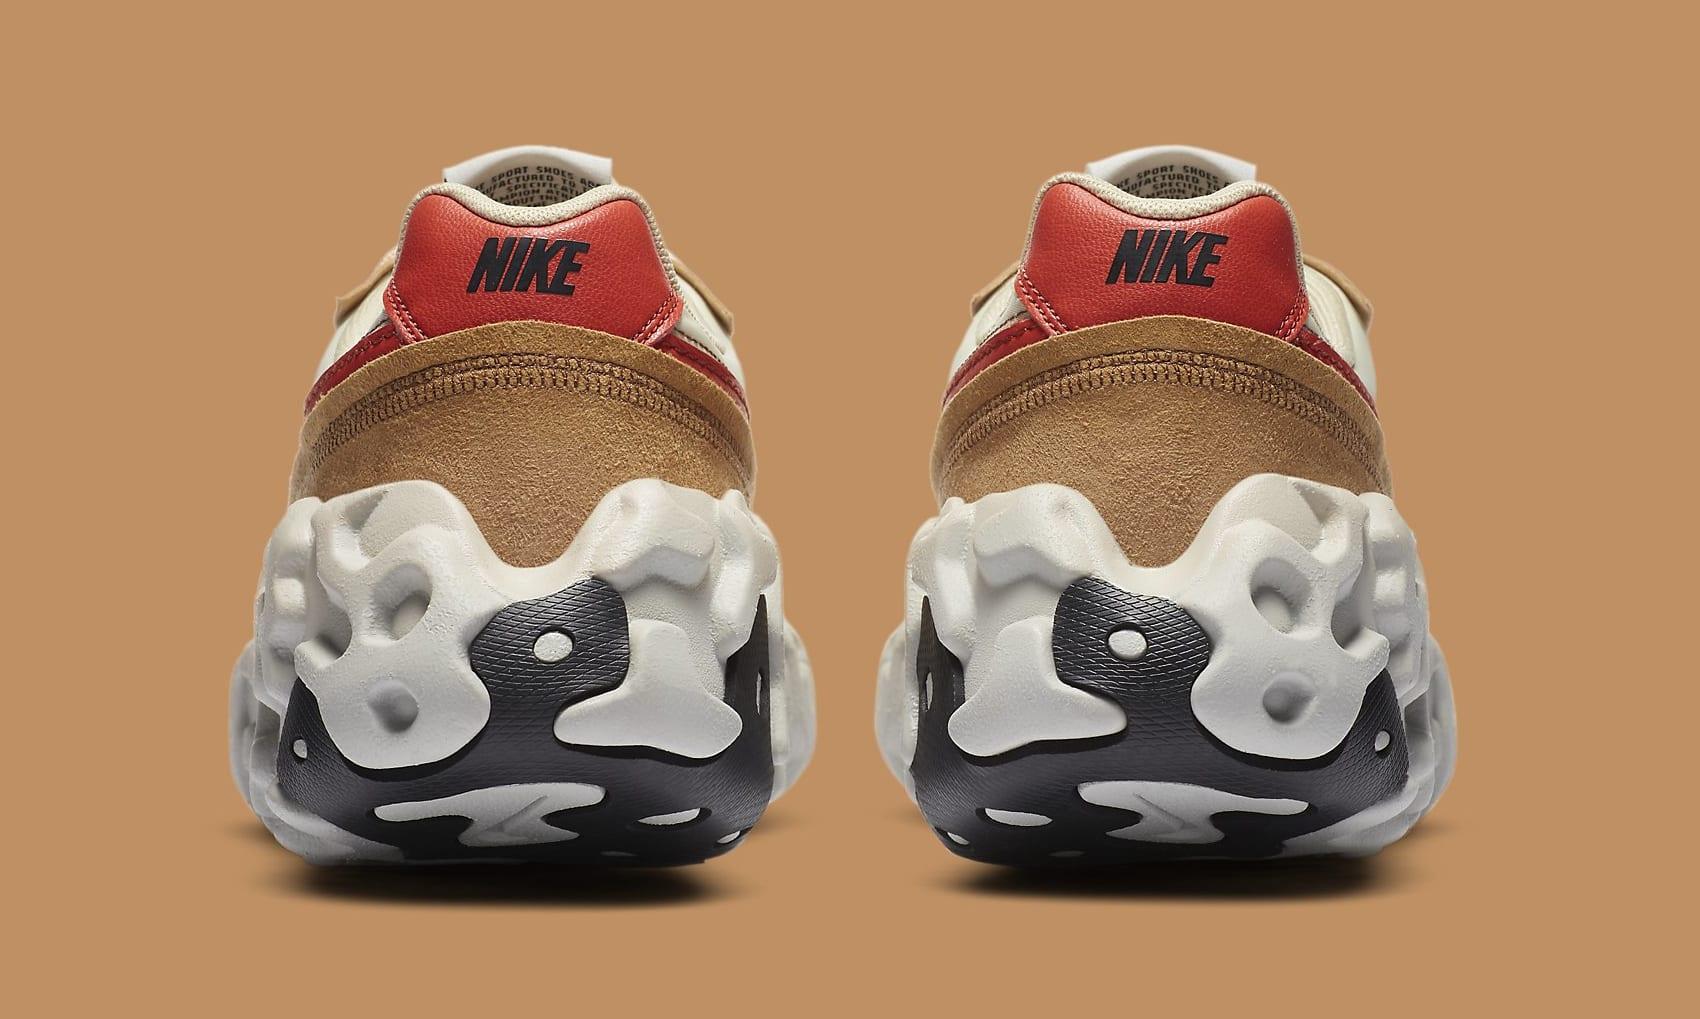 Nike OverBreak 'Mars Yard' DA9784-700 Heel